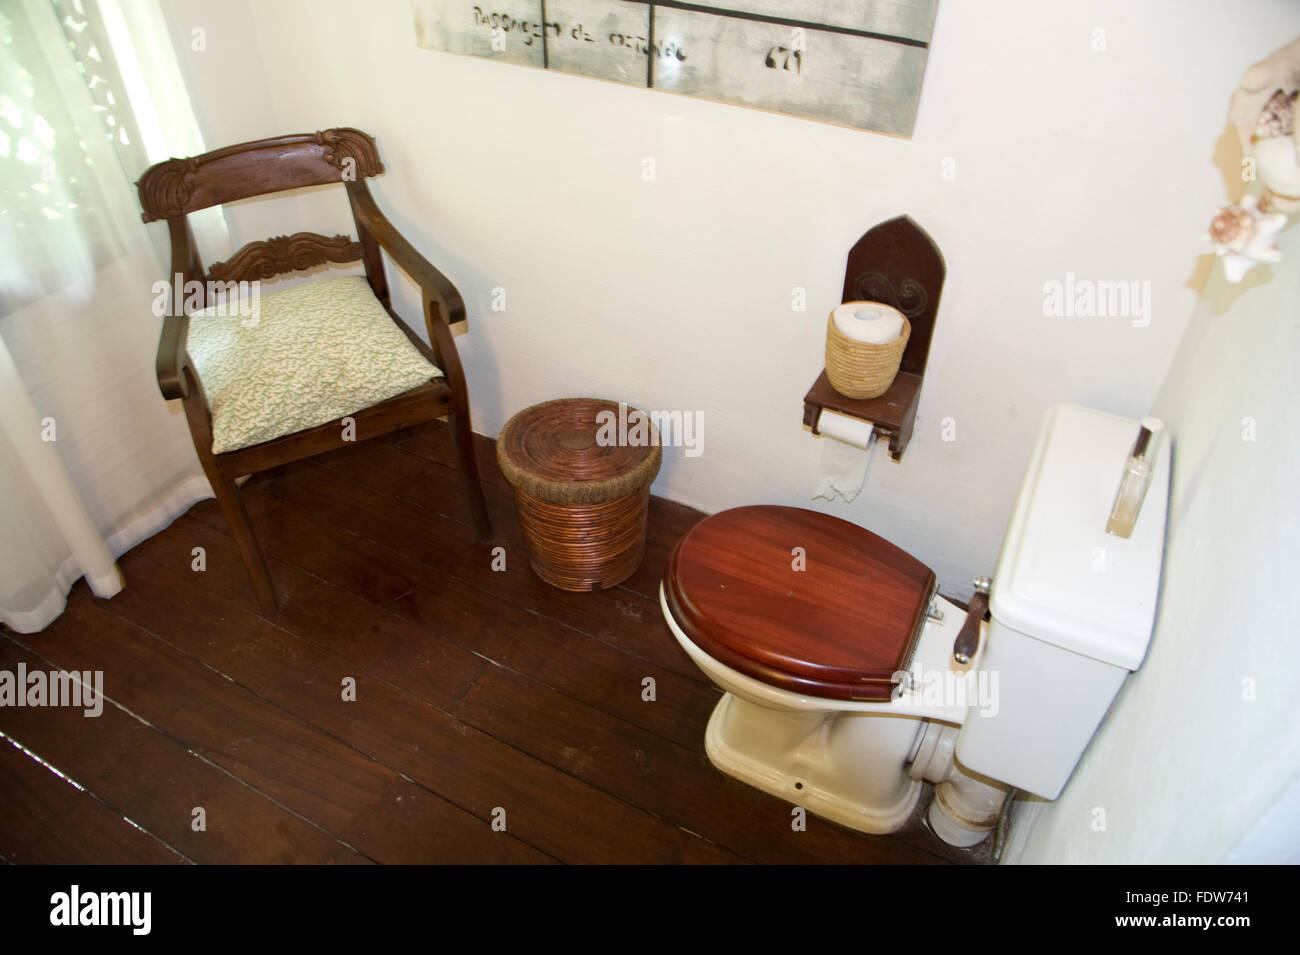 Toilet Chair Stock Photos & Toilet Chair Stock Images - Alamy